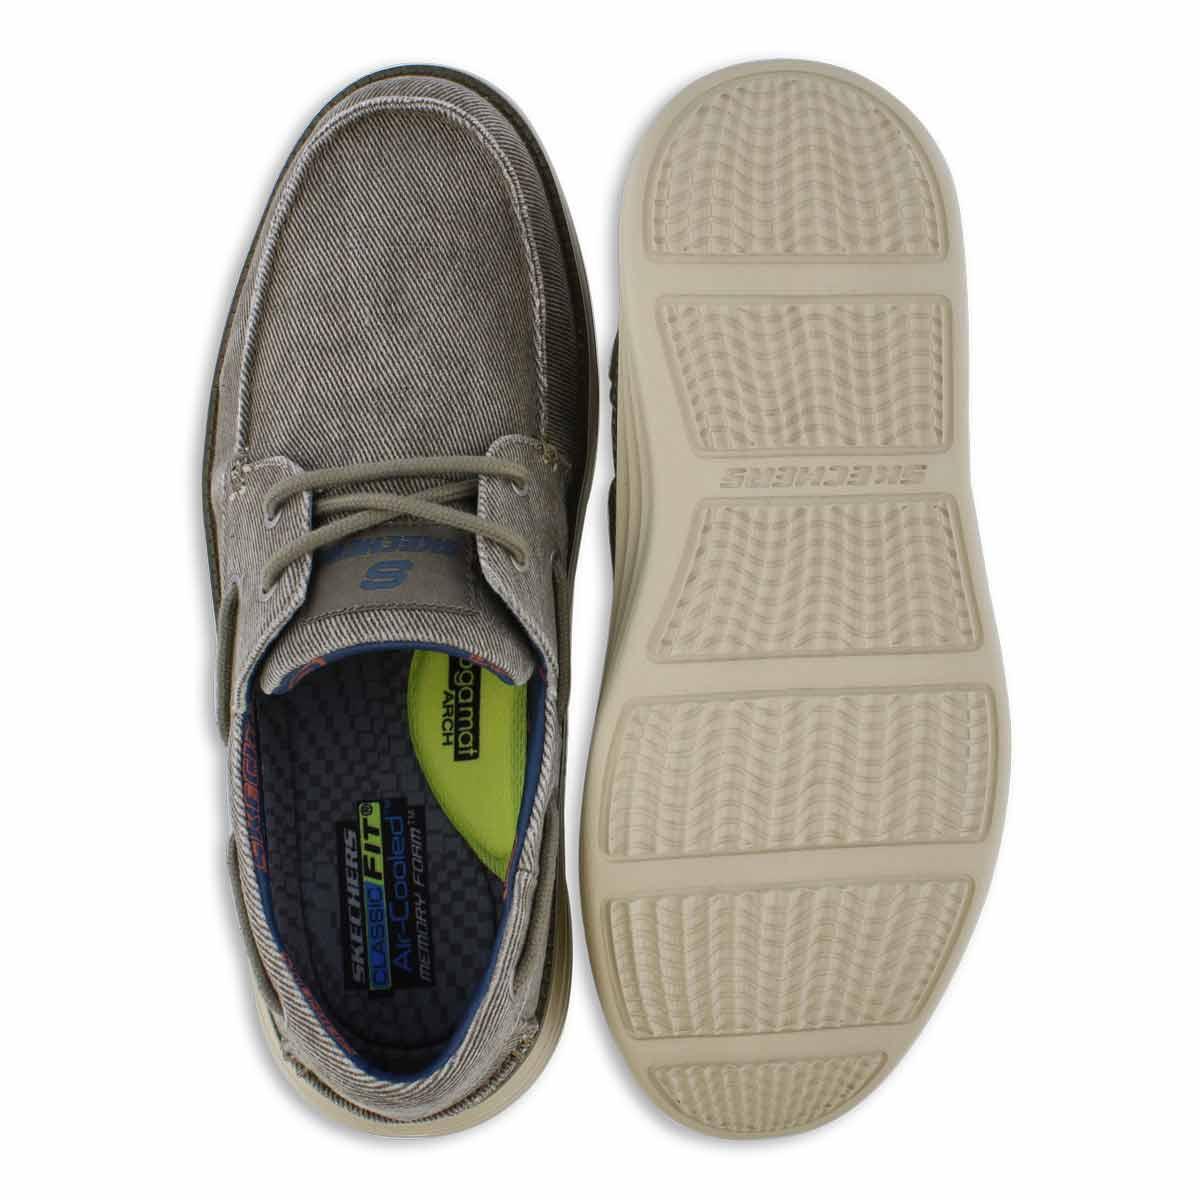 Mns Status 2.0 Lorano taupe boat shoe